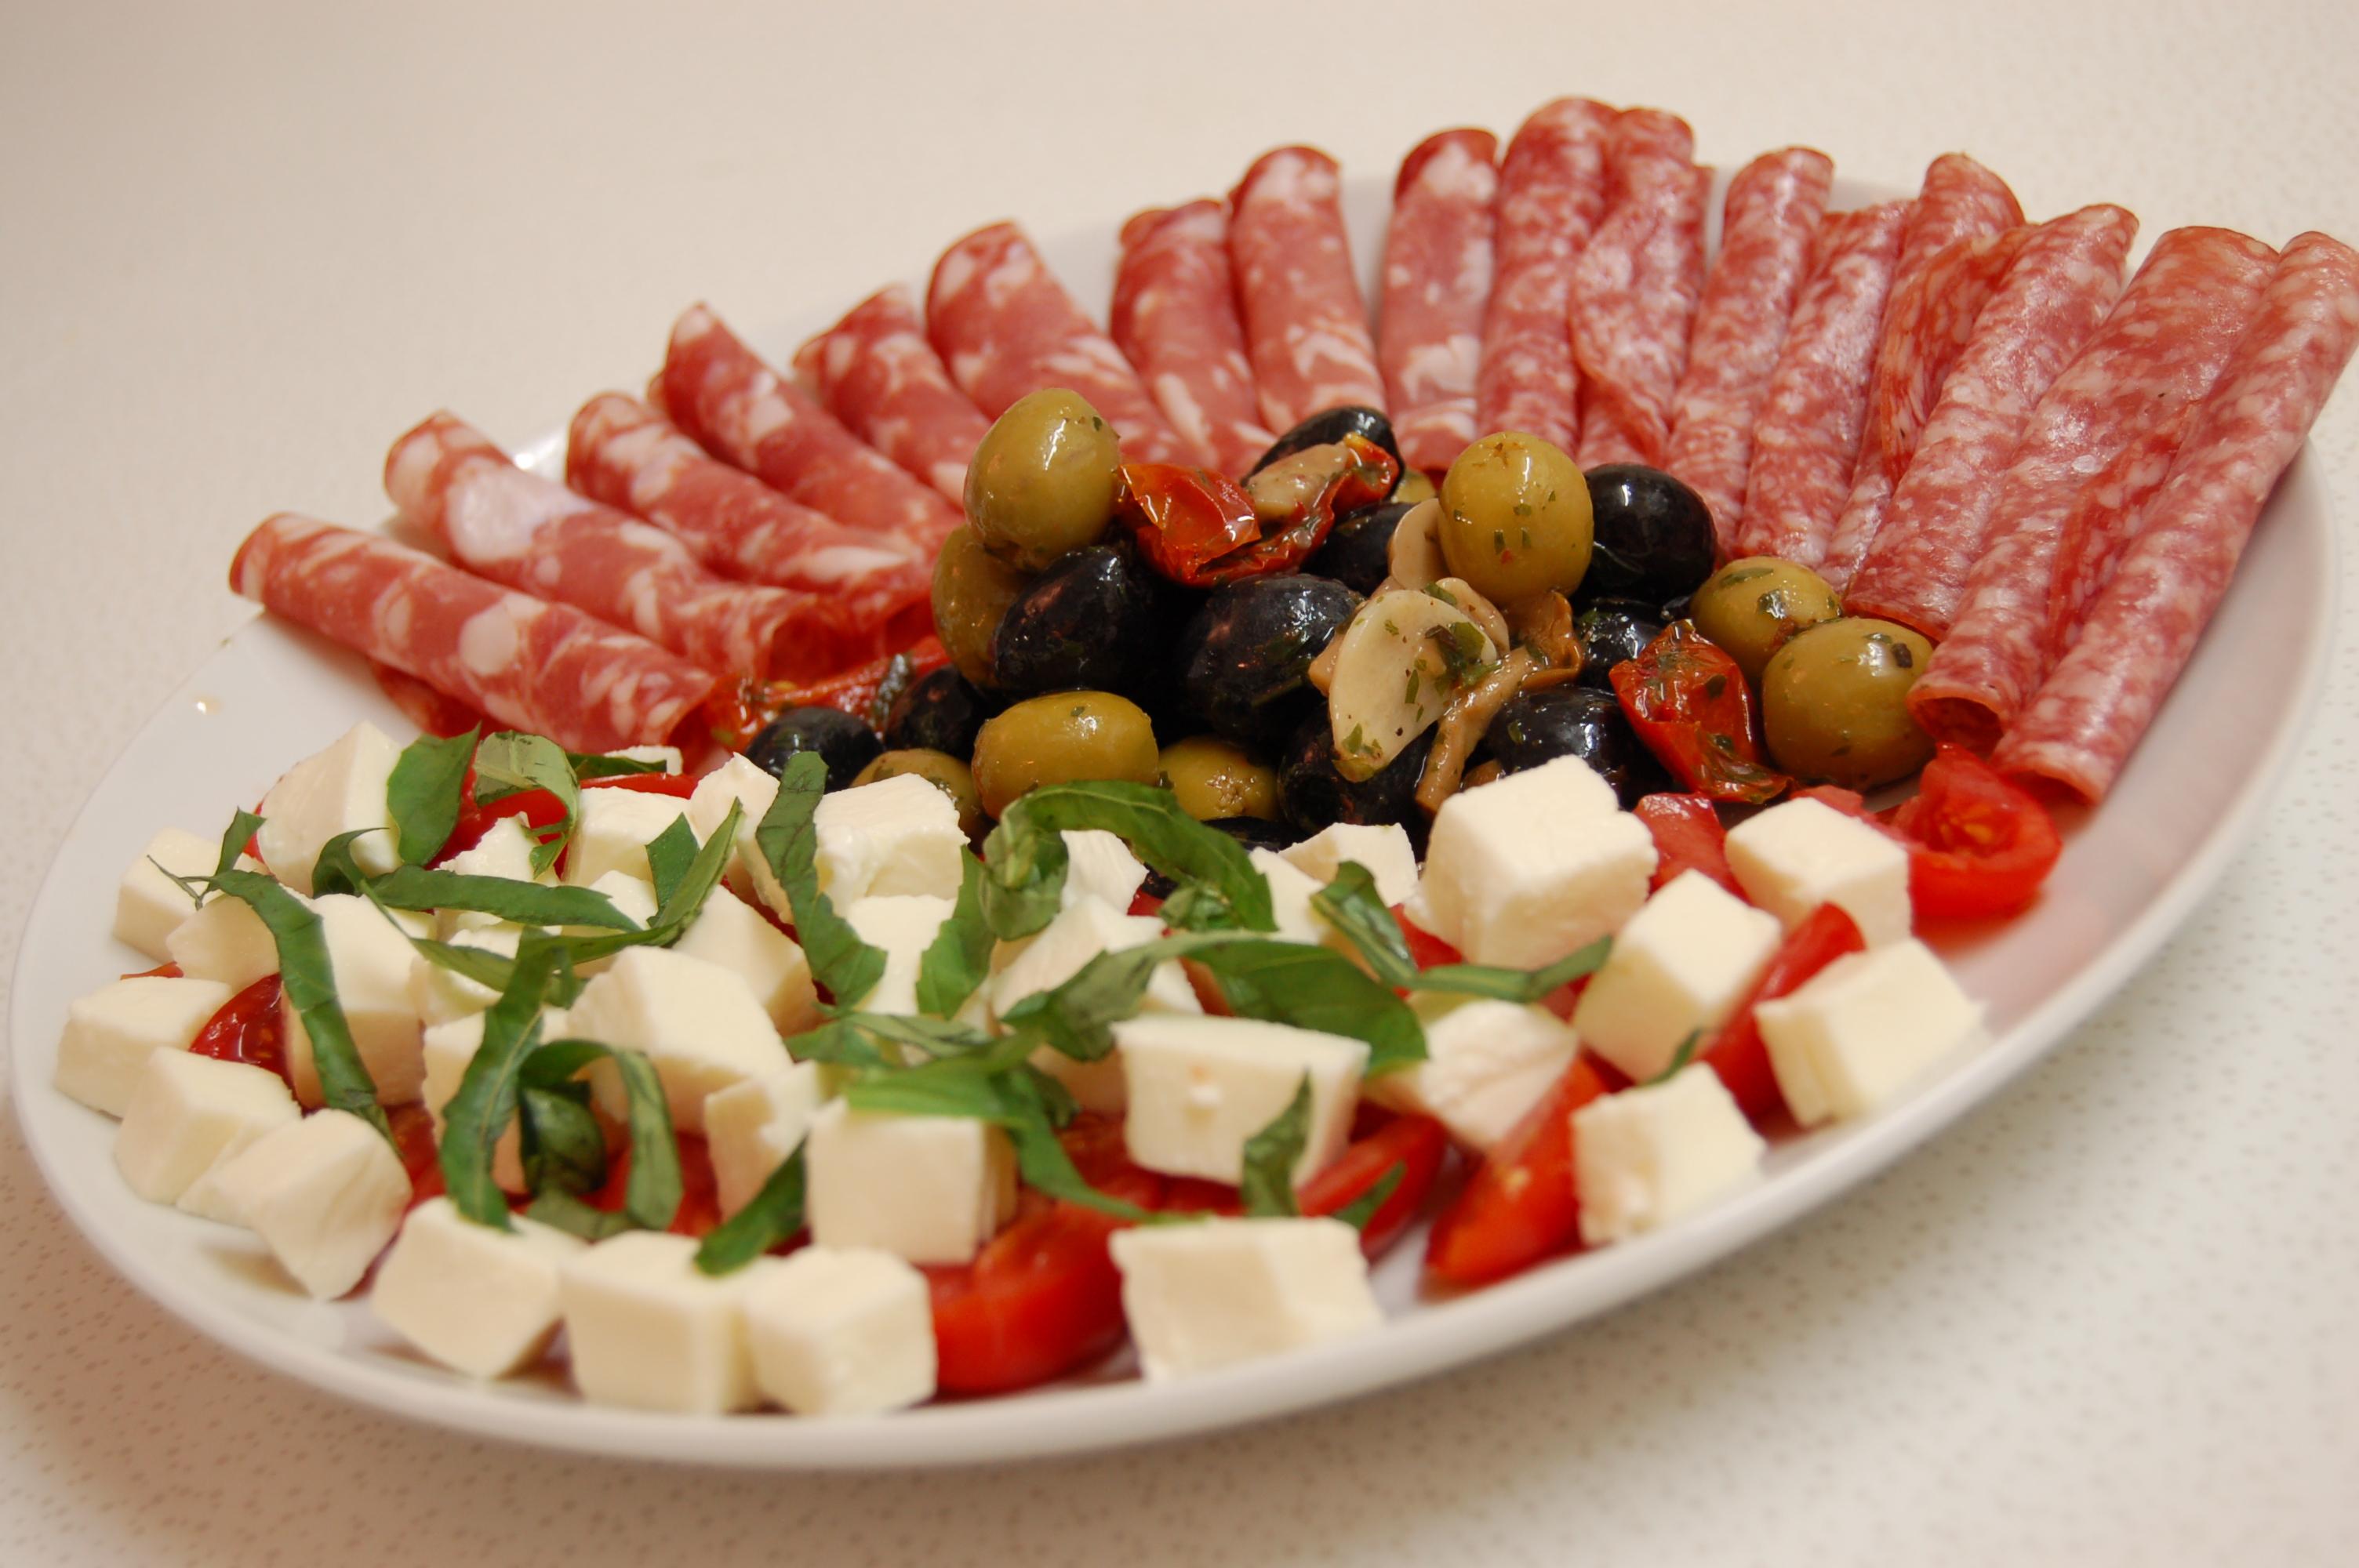 Antipasto (Italian appetizers)